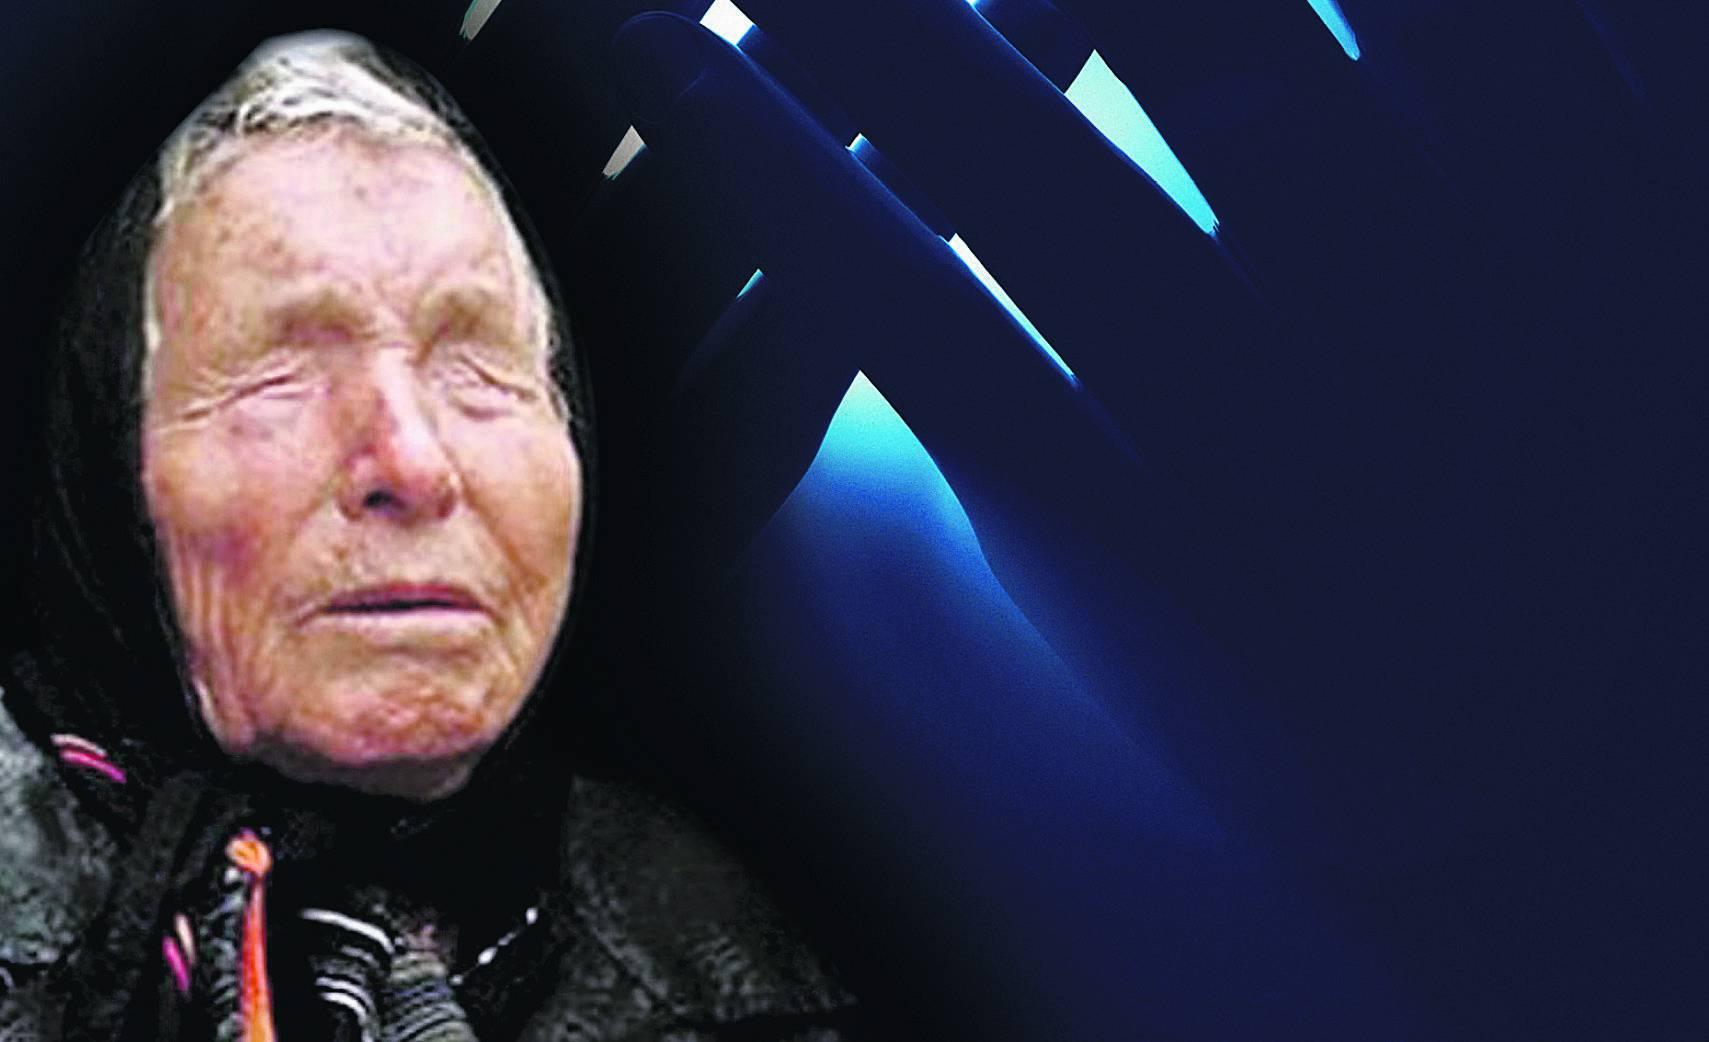 Ekskluzivne priče: Tajanstvena proročanstva slijepe vizionarke